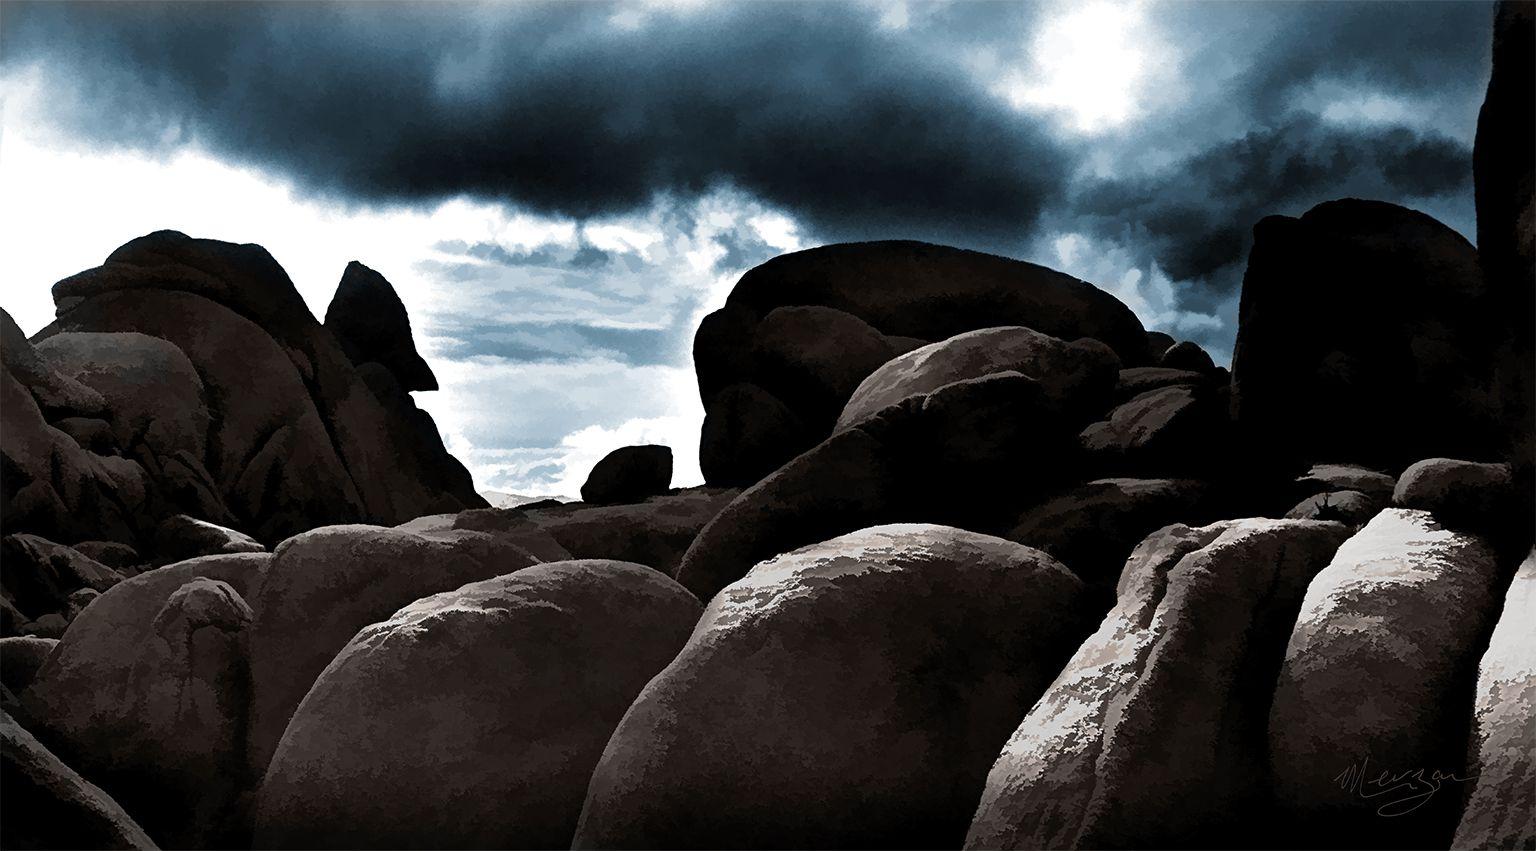 Journey into the Shadows by Merzan